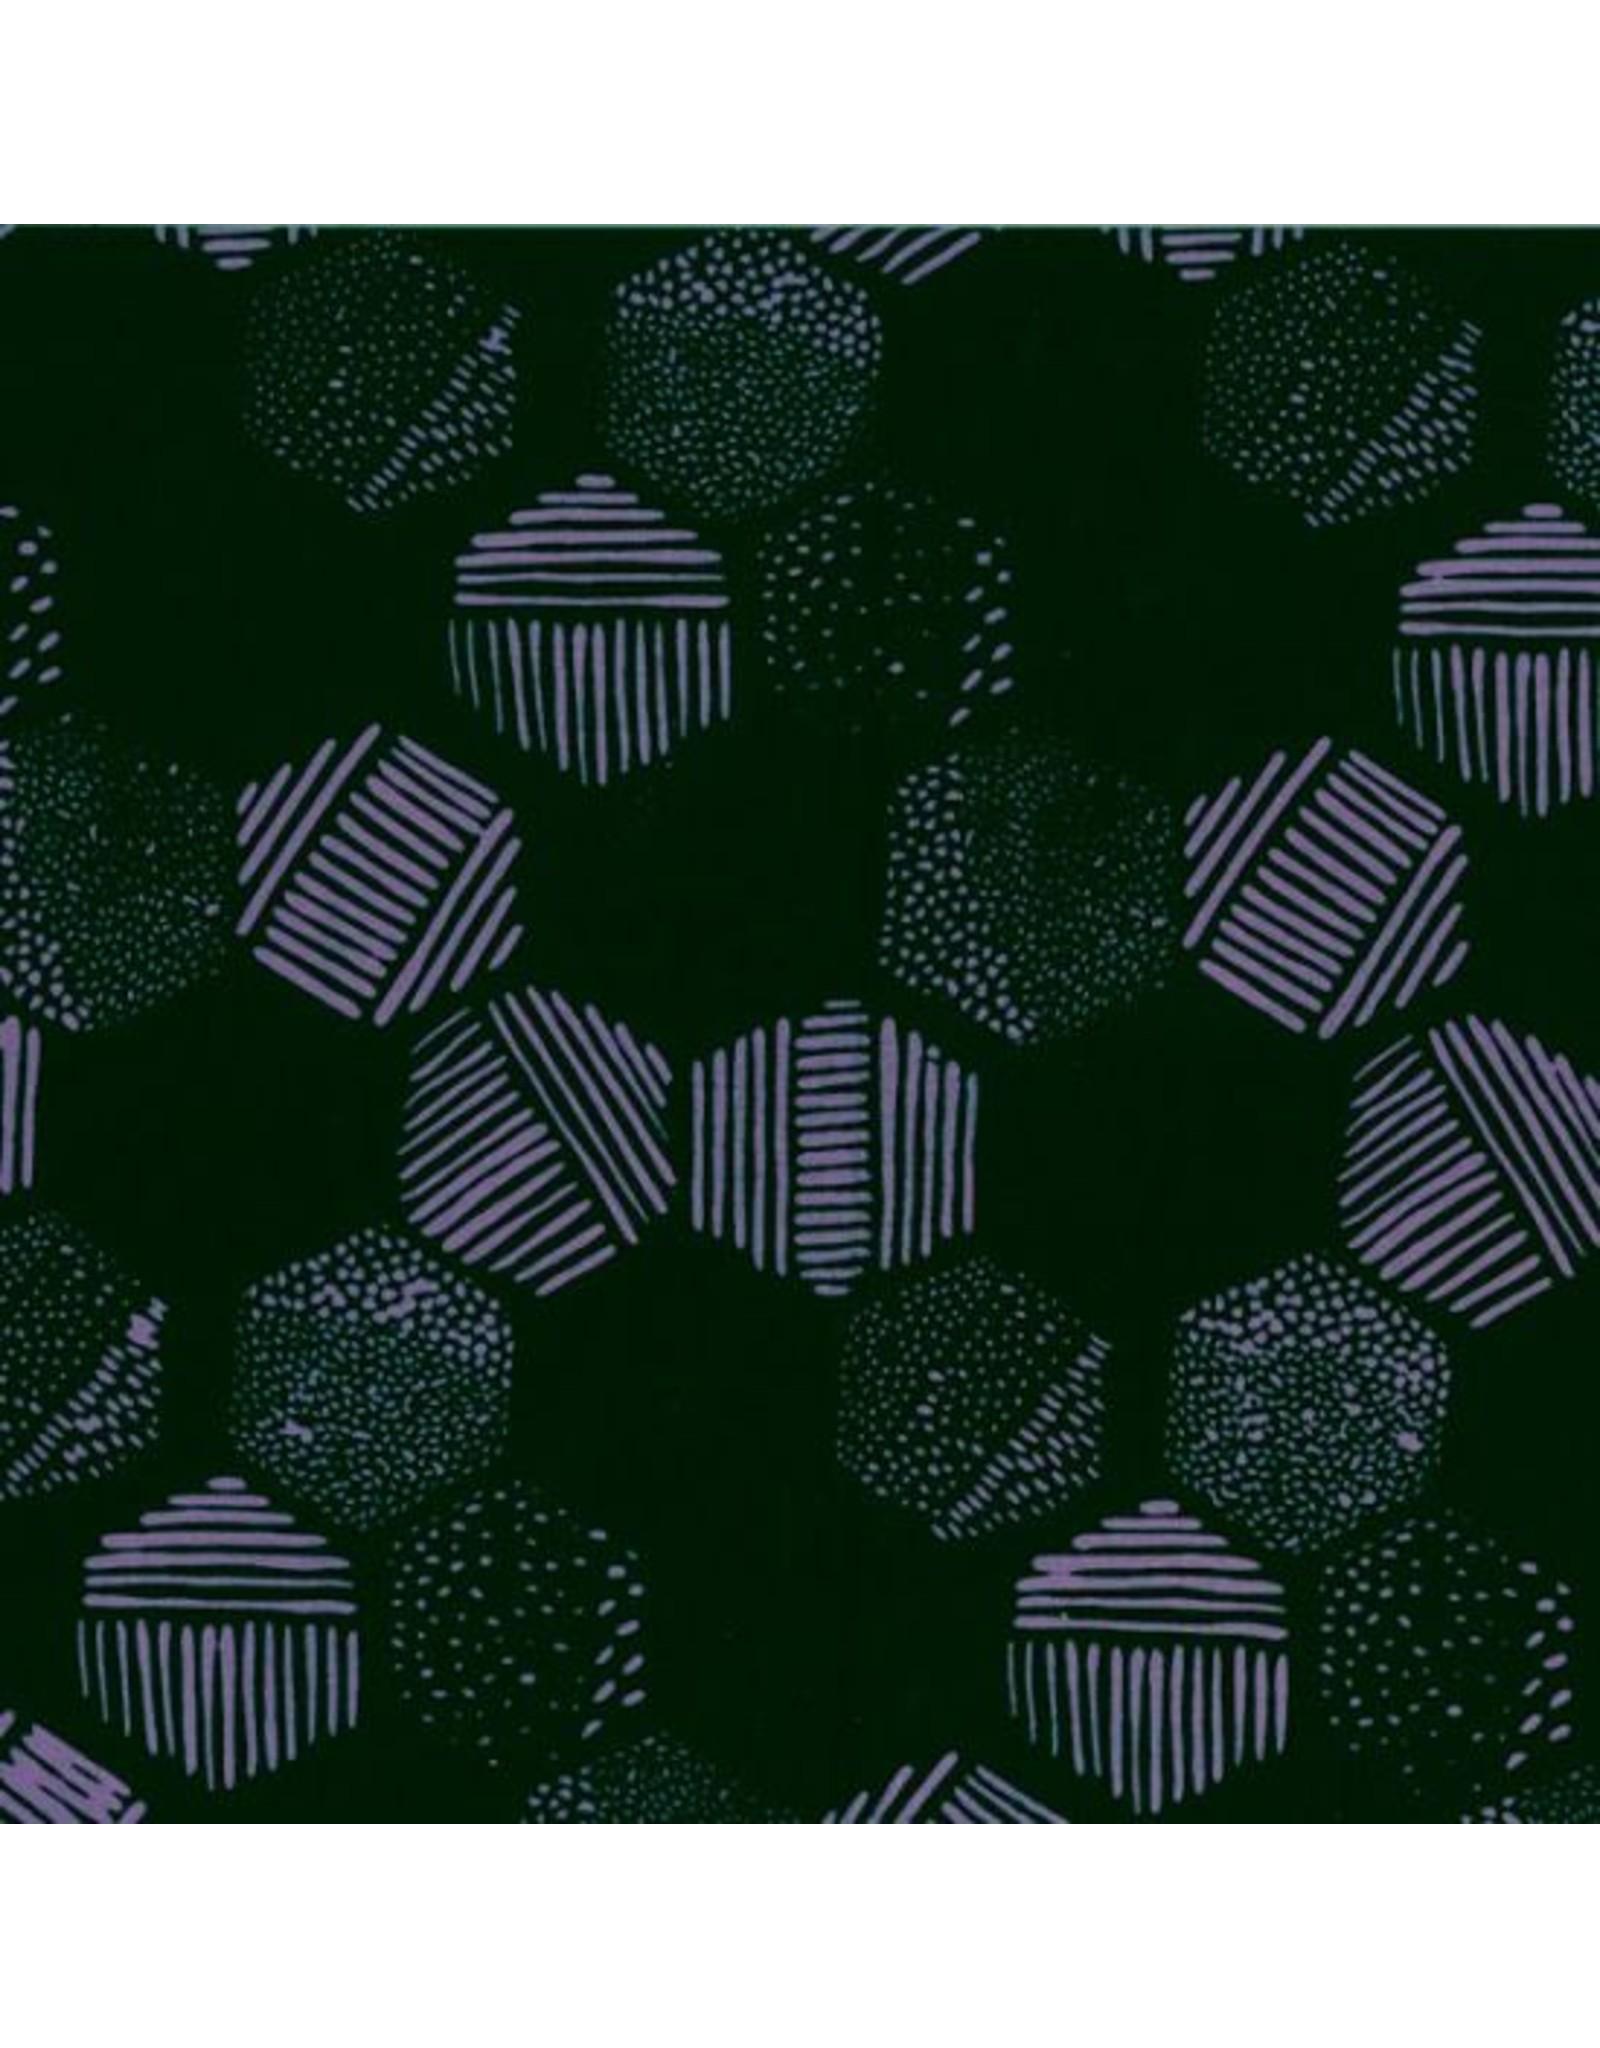 Me+You by Hoffman Fabrics Indah Batiks - 180-Black Grape